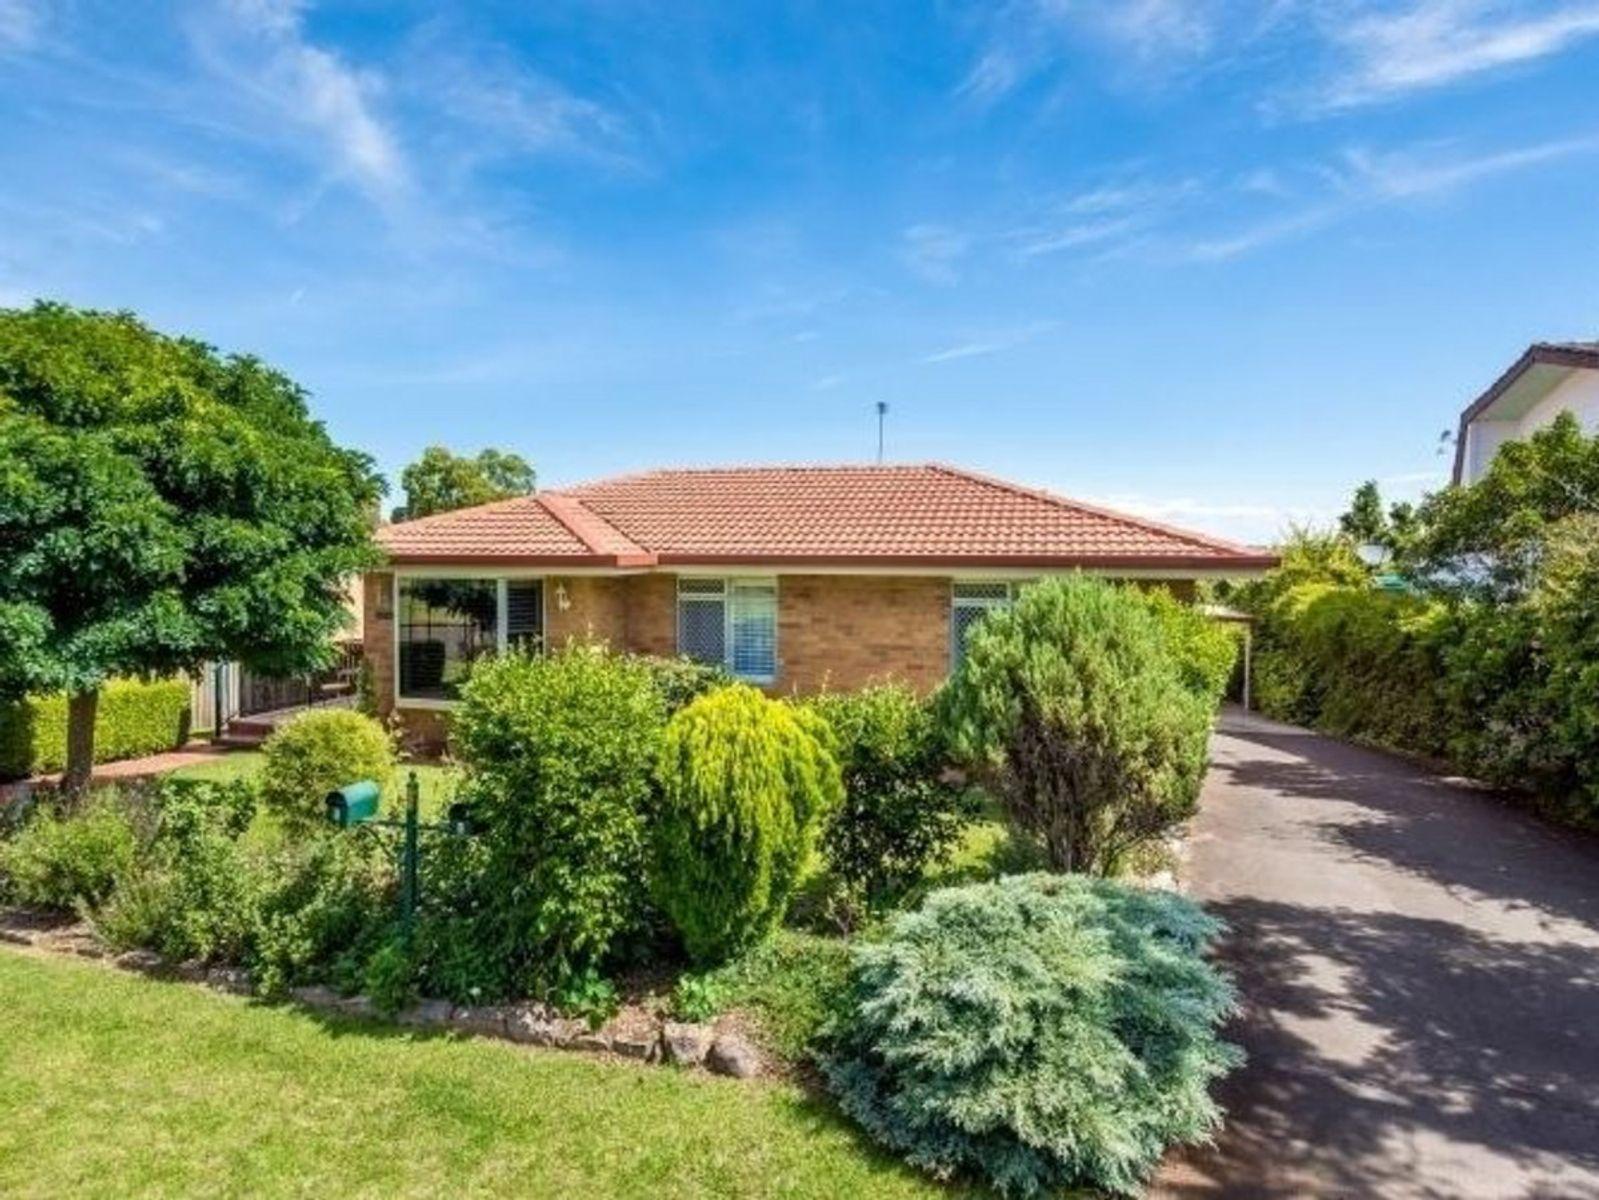 1/37 Barrymount Crescent, Mount Lofty, QLD 4350